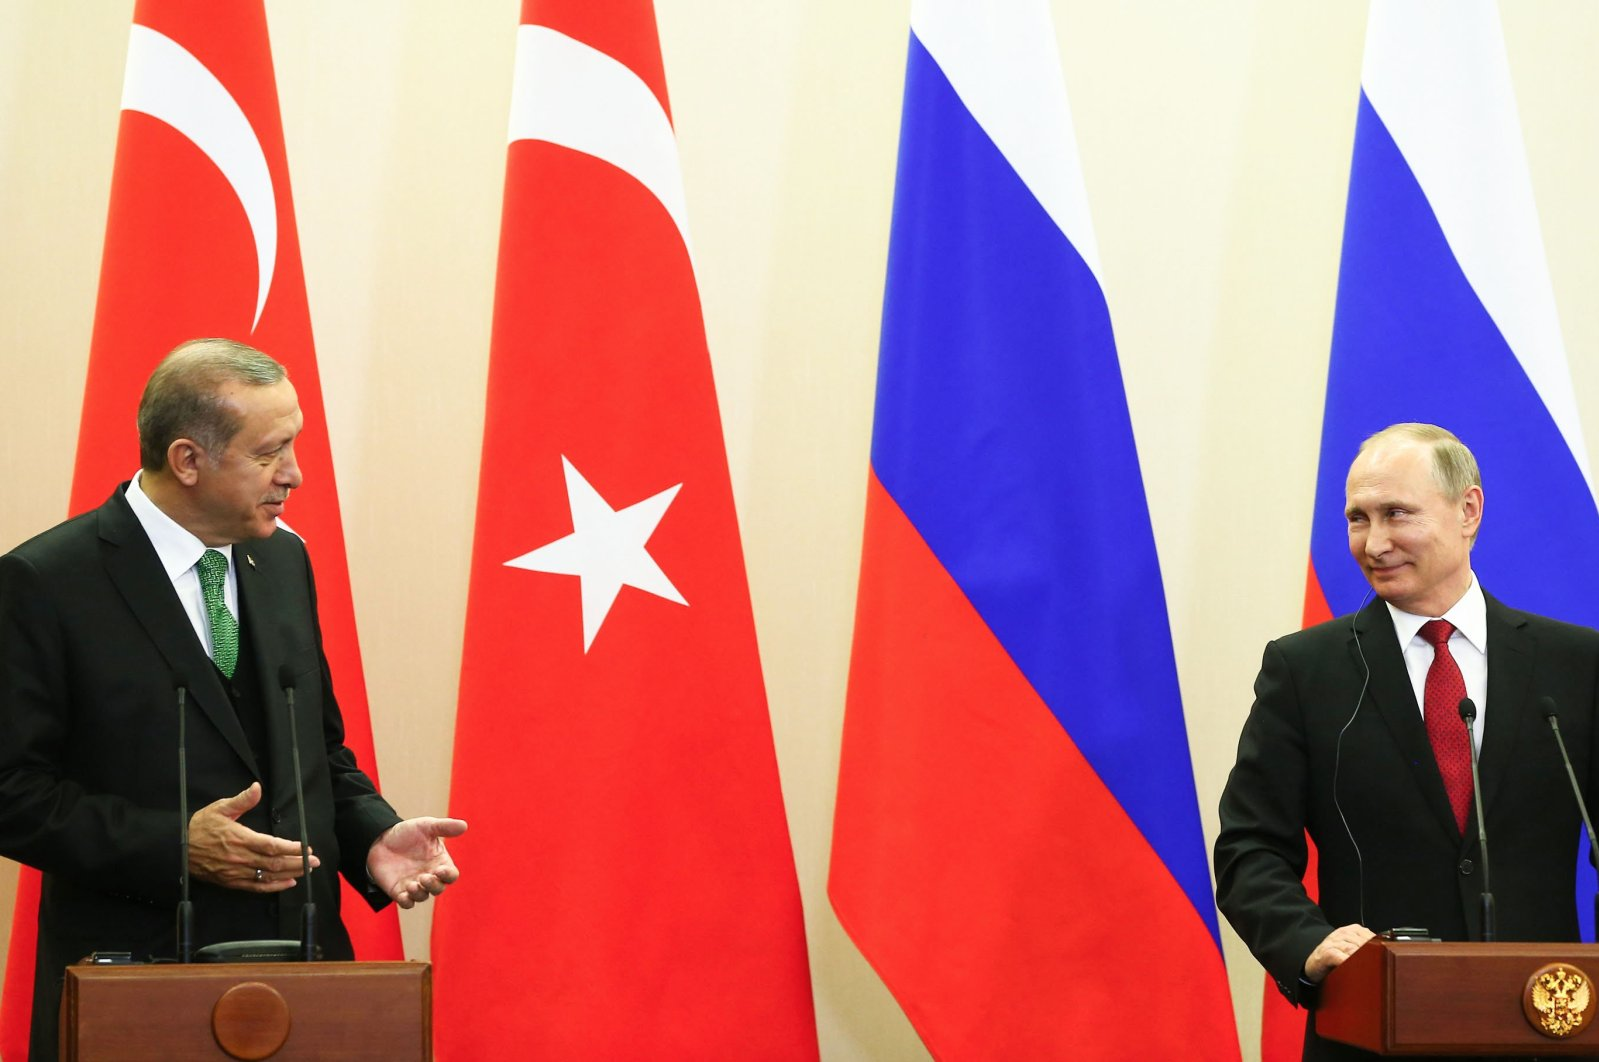 President Recep Tayyip Erdoğan (L) and Russian President Vladimir Putin speak during a joint press conference in Ankara, Turkey, May 3, 2017. (Sabah Photo)